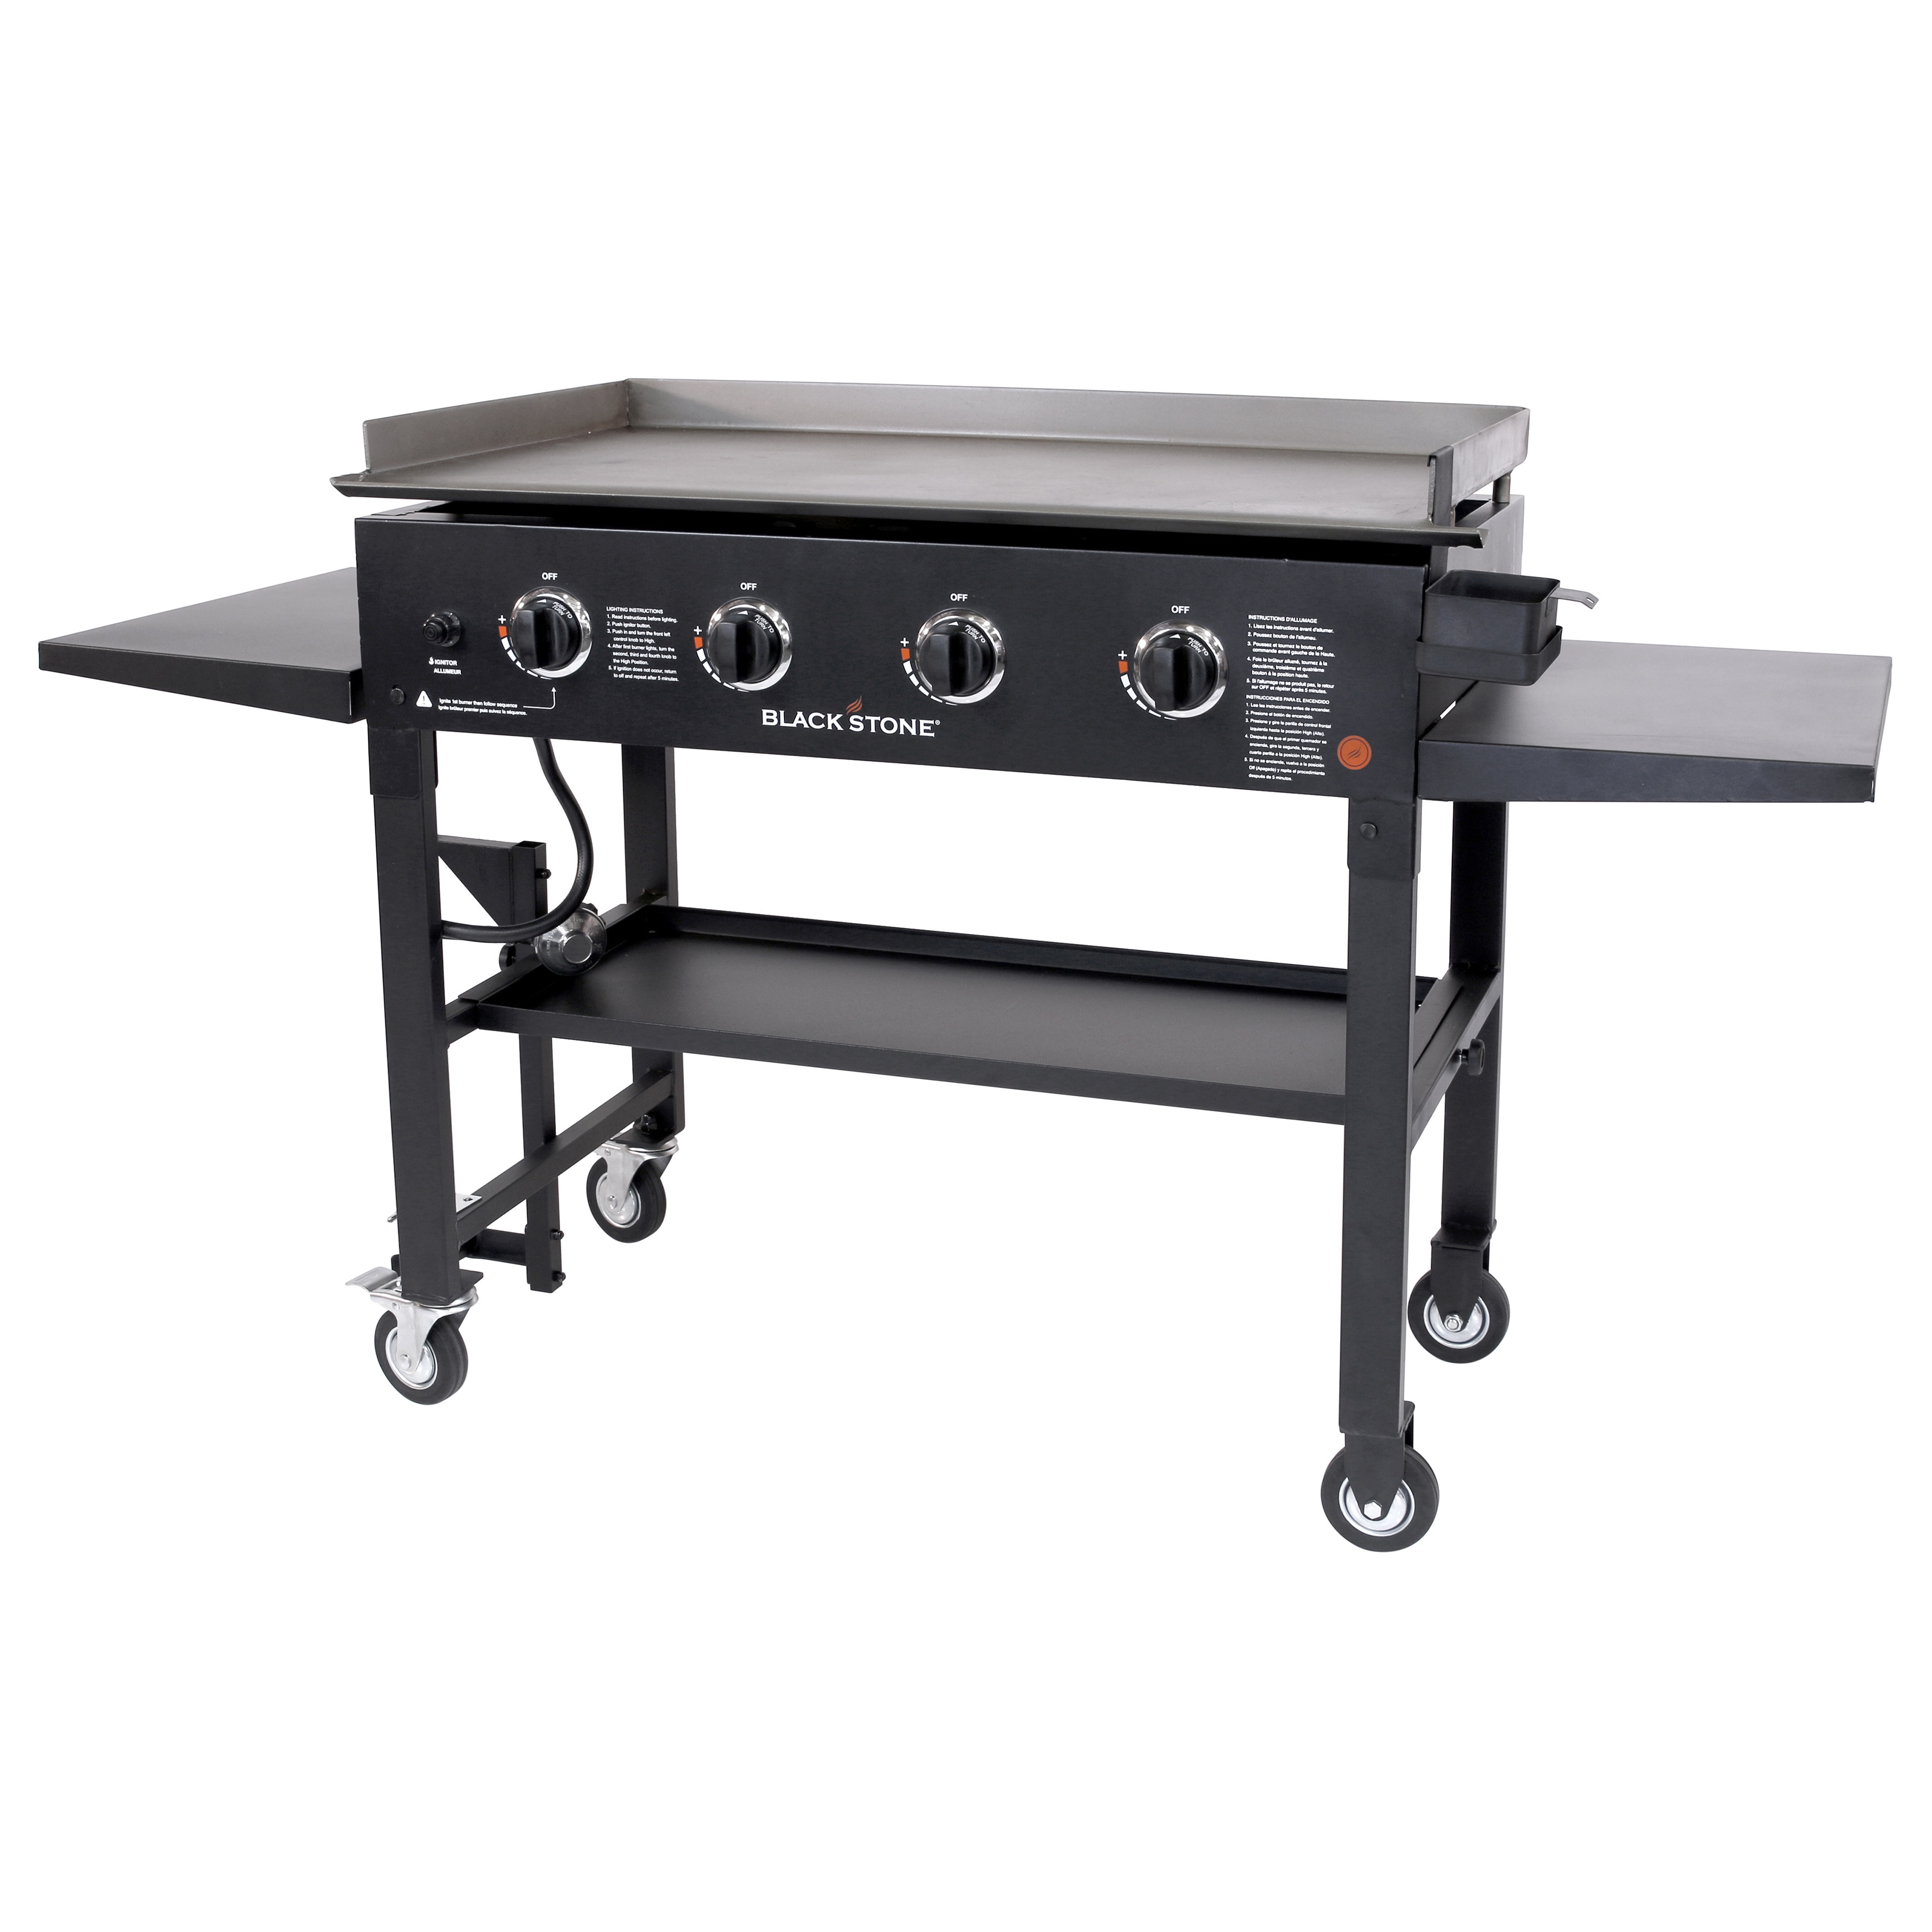 Blackstone Black Steel Restaurant-grade Propane Gas Flat 4-burner ...